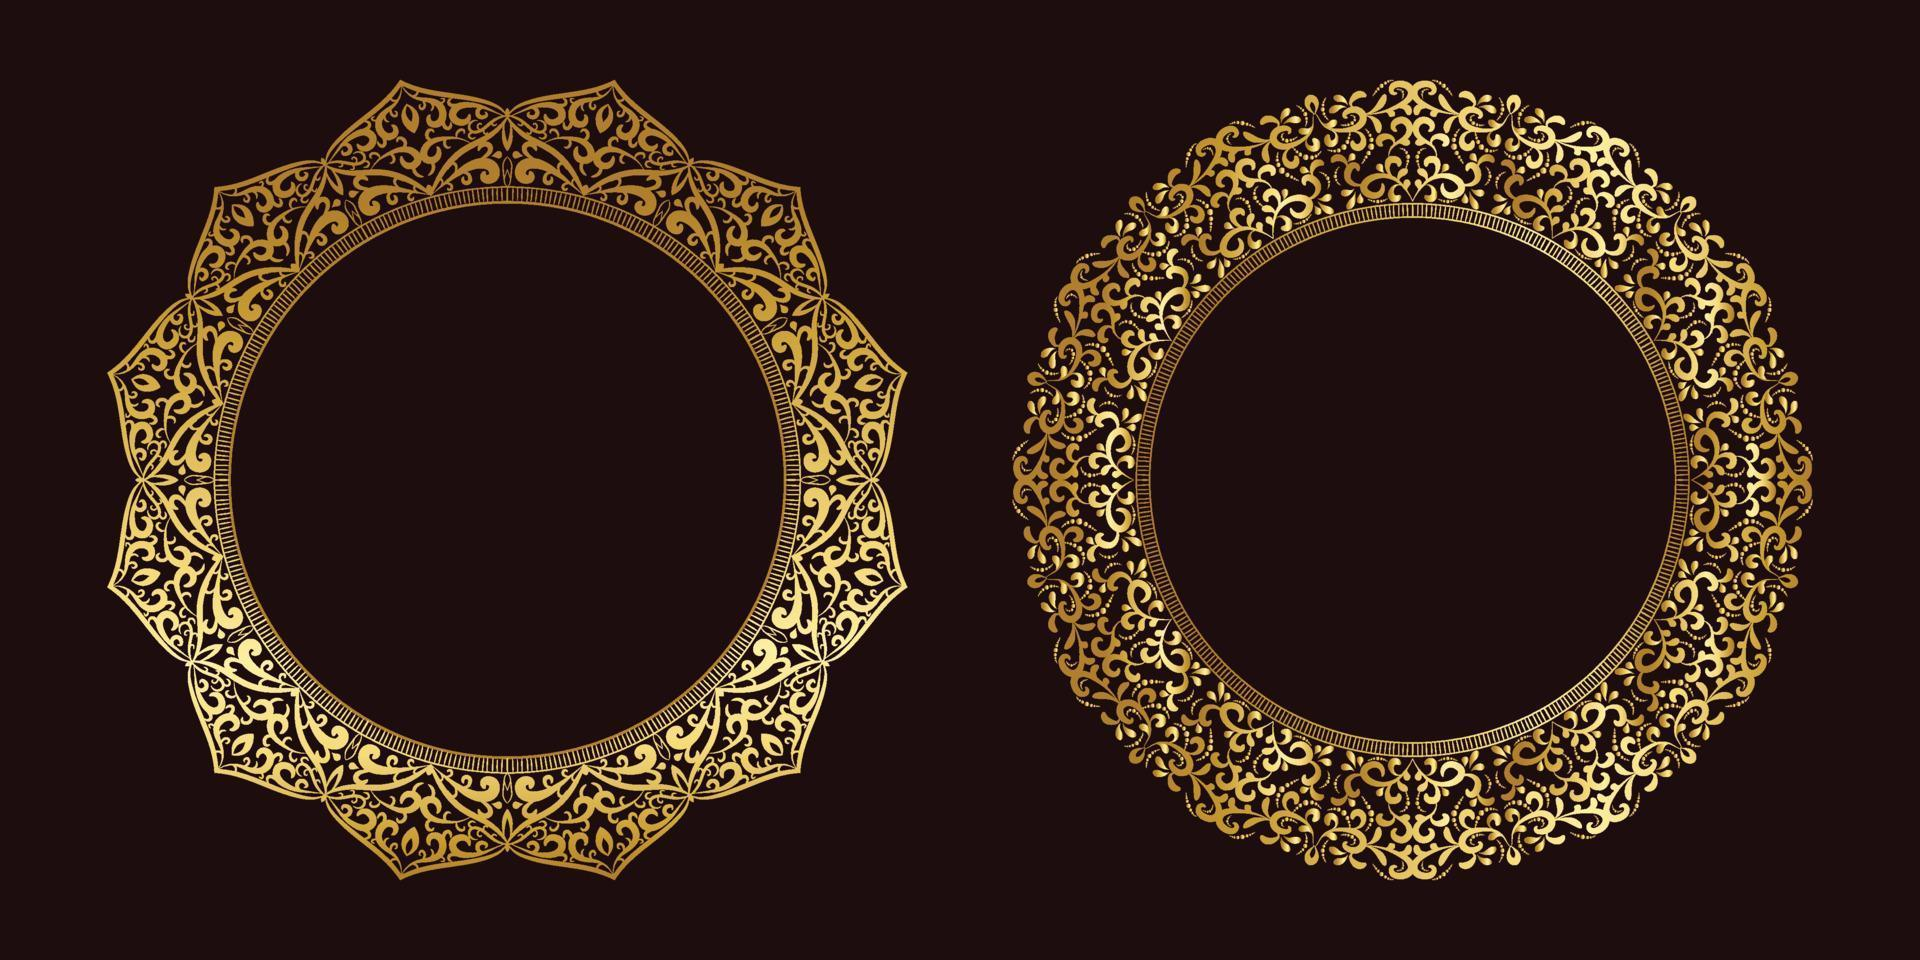 quadro de luxo definido conceito de flor de mandala dourada vetor